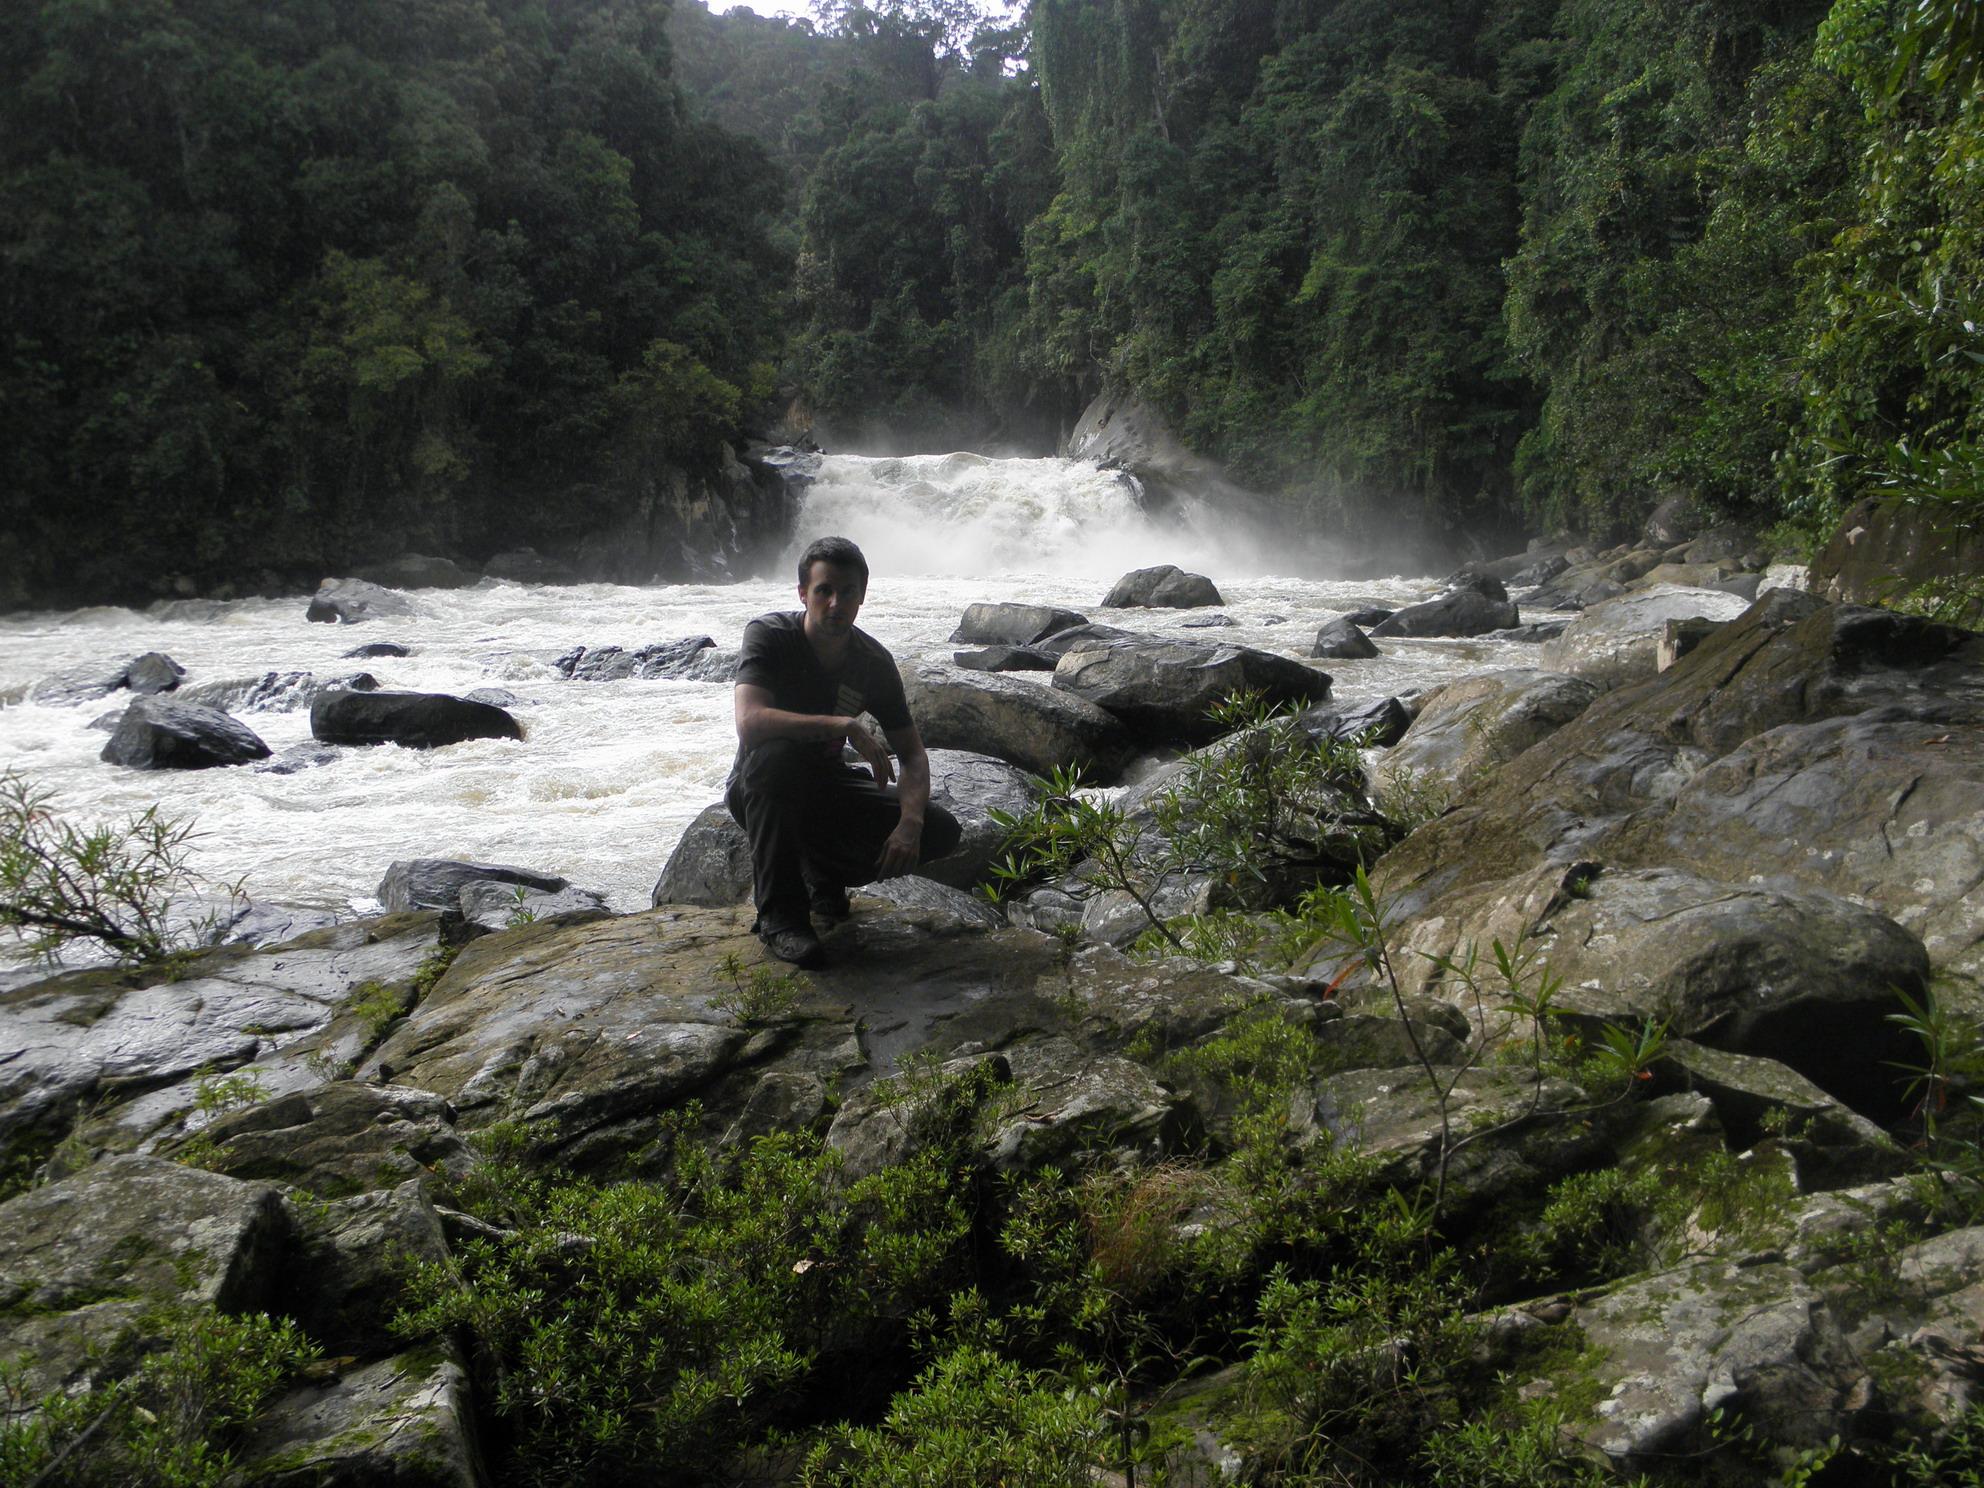 kayan mentarang park, jungle, dayak, culture, rain forest, guide, tour, borneo, indonesia, trip